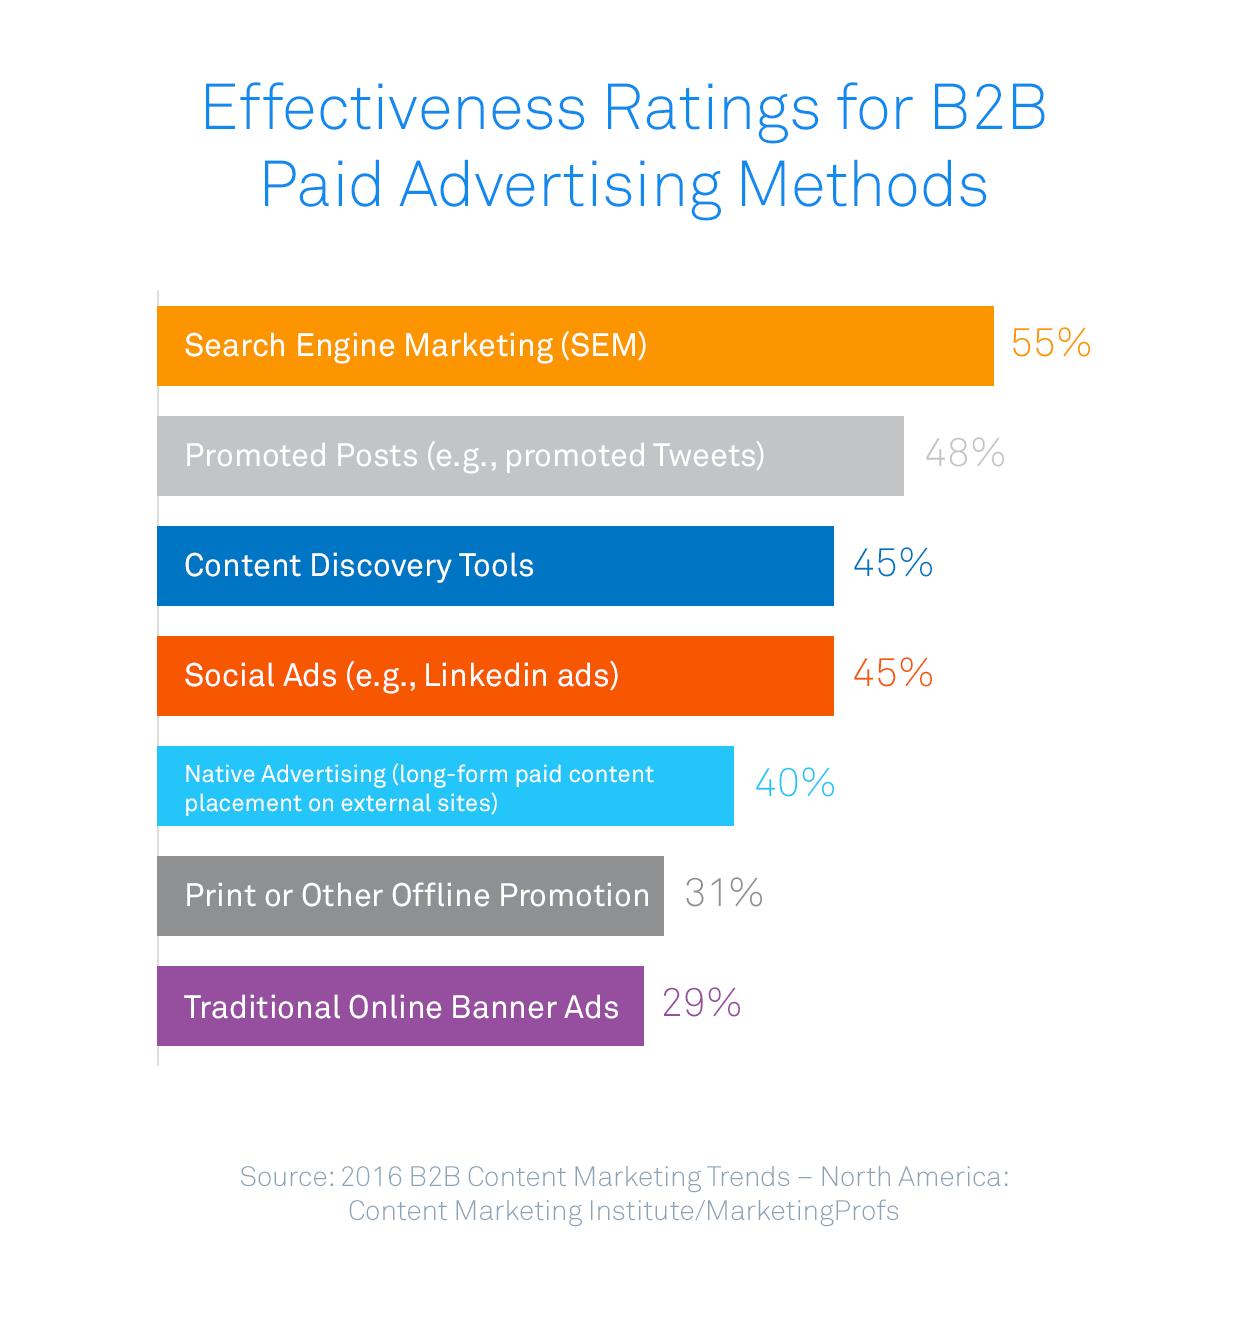 https://intercom.com/blog/wp-content/uploads/2015/11/effectiveness_paid_advertising.png